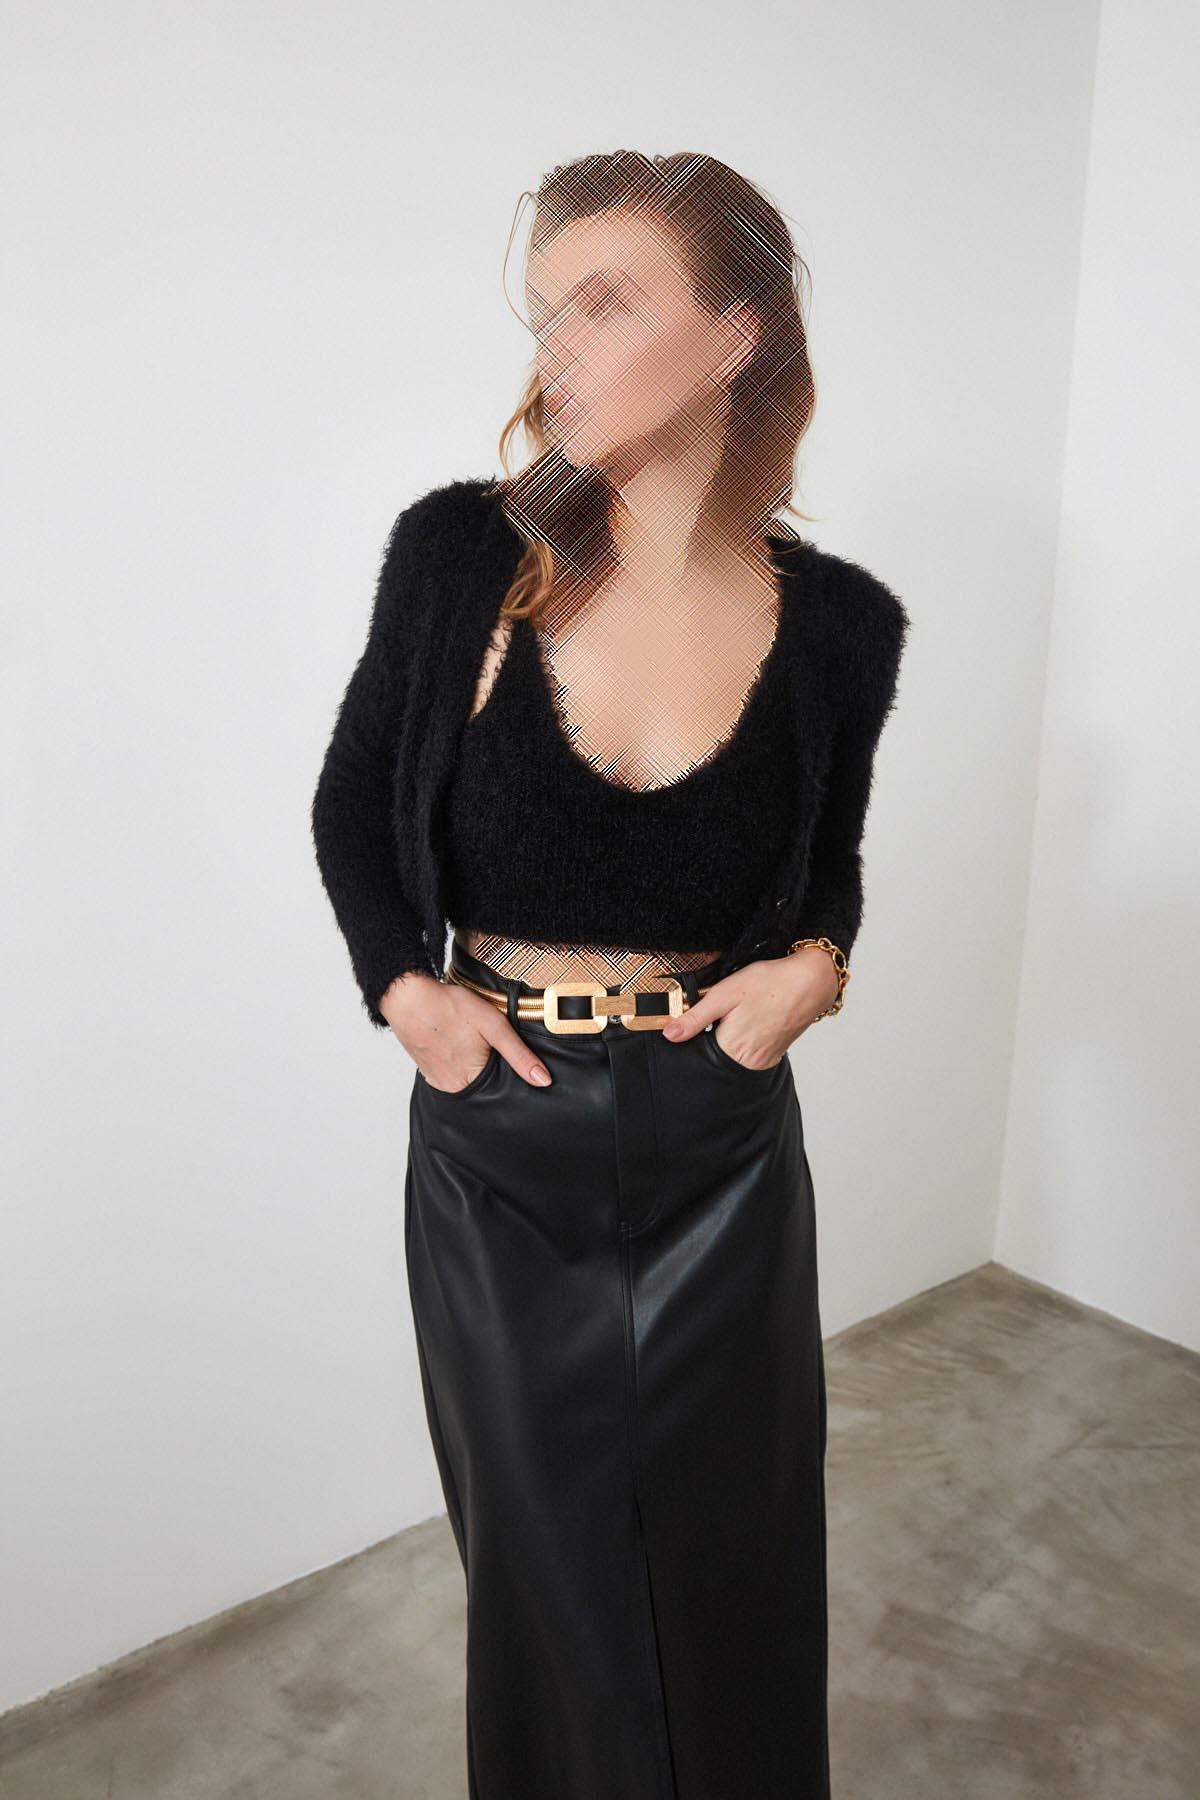 ژاکت بافتی زنانه برند ترندیول میلا ترک رنگ مشکی کد ty35461231